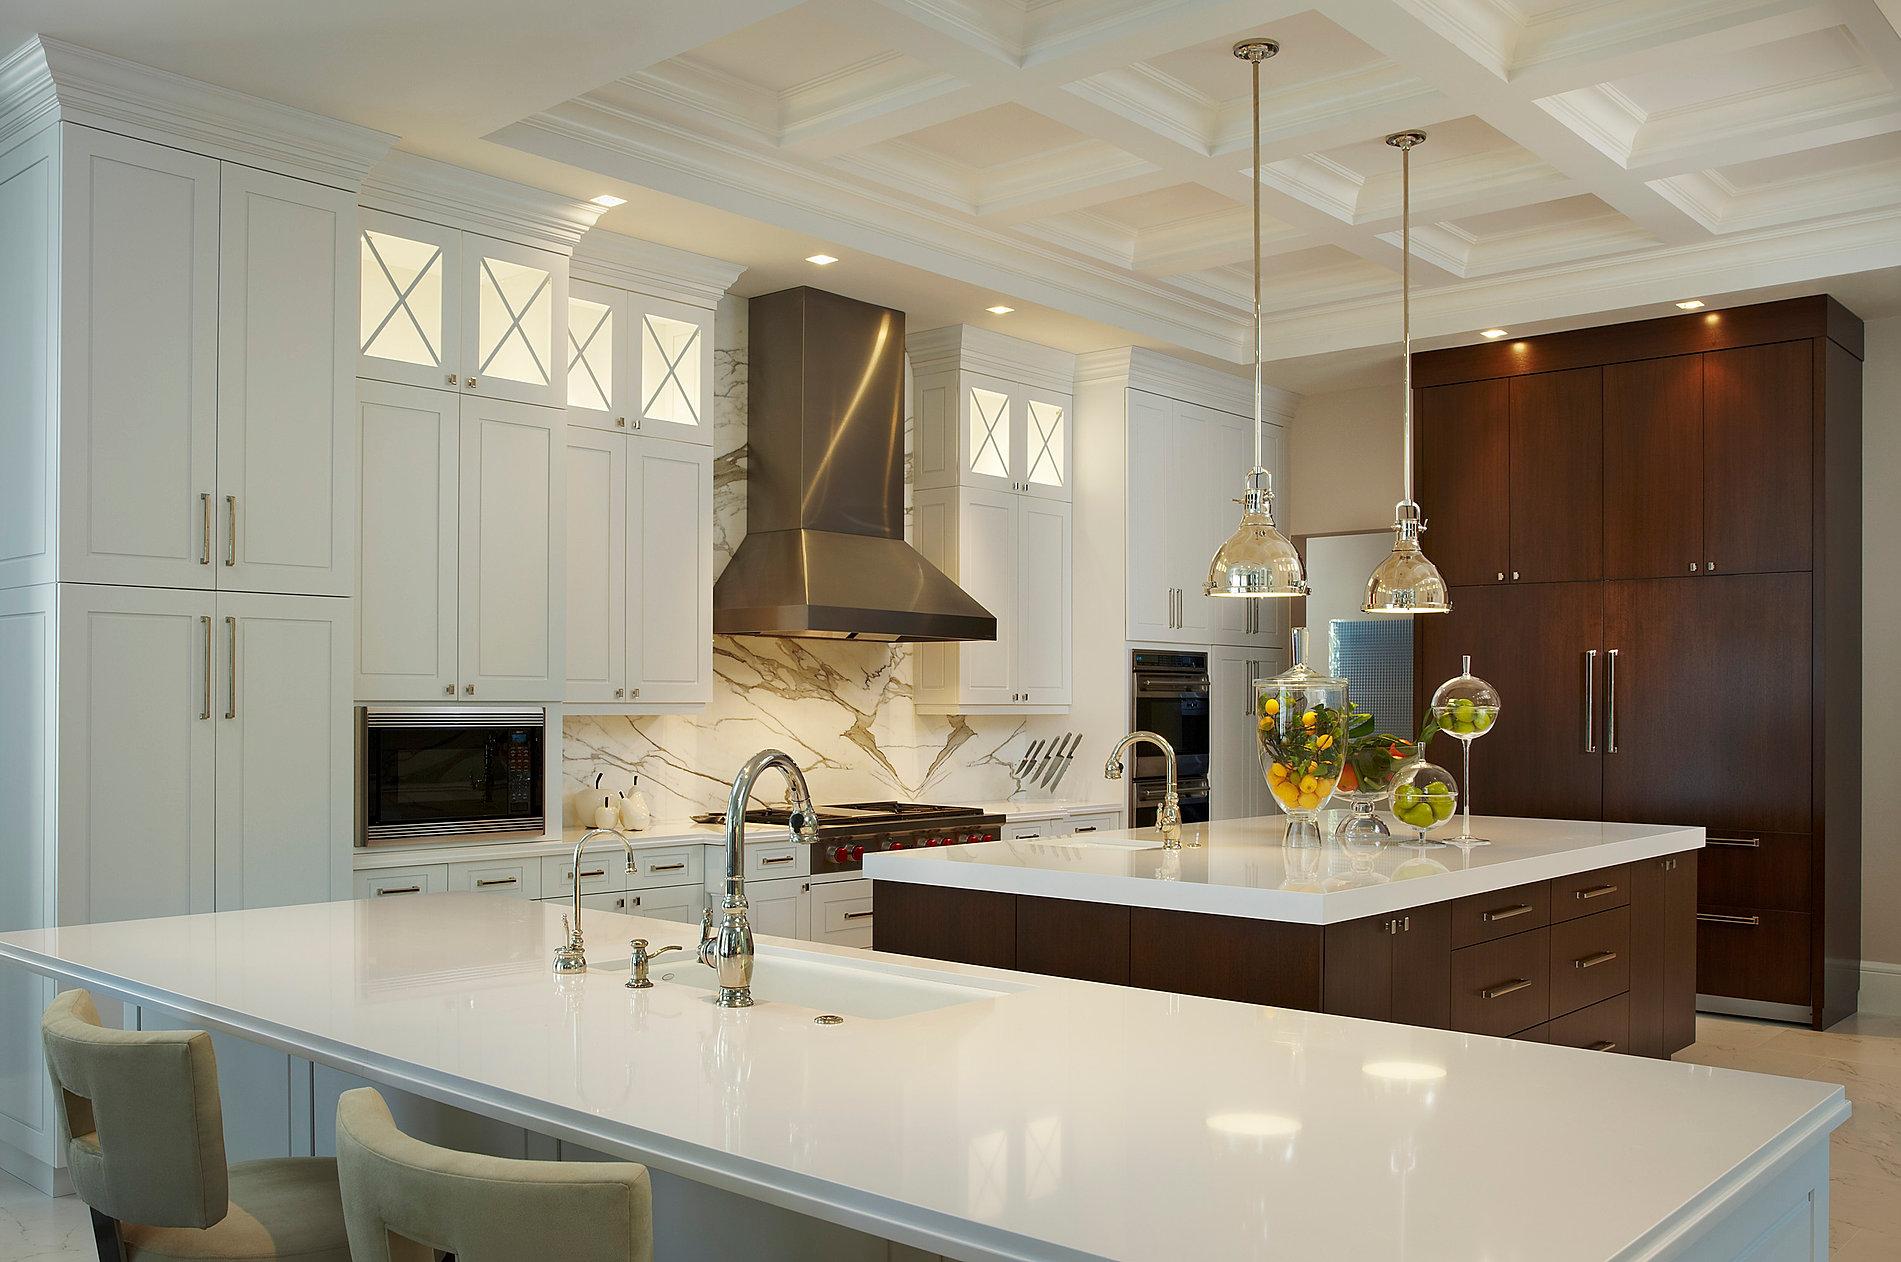 White Galaxy Granite Kitchen Galaxy Marble Inc Kitchen Countertops With Granite Marble Quartz